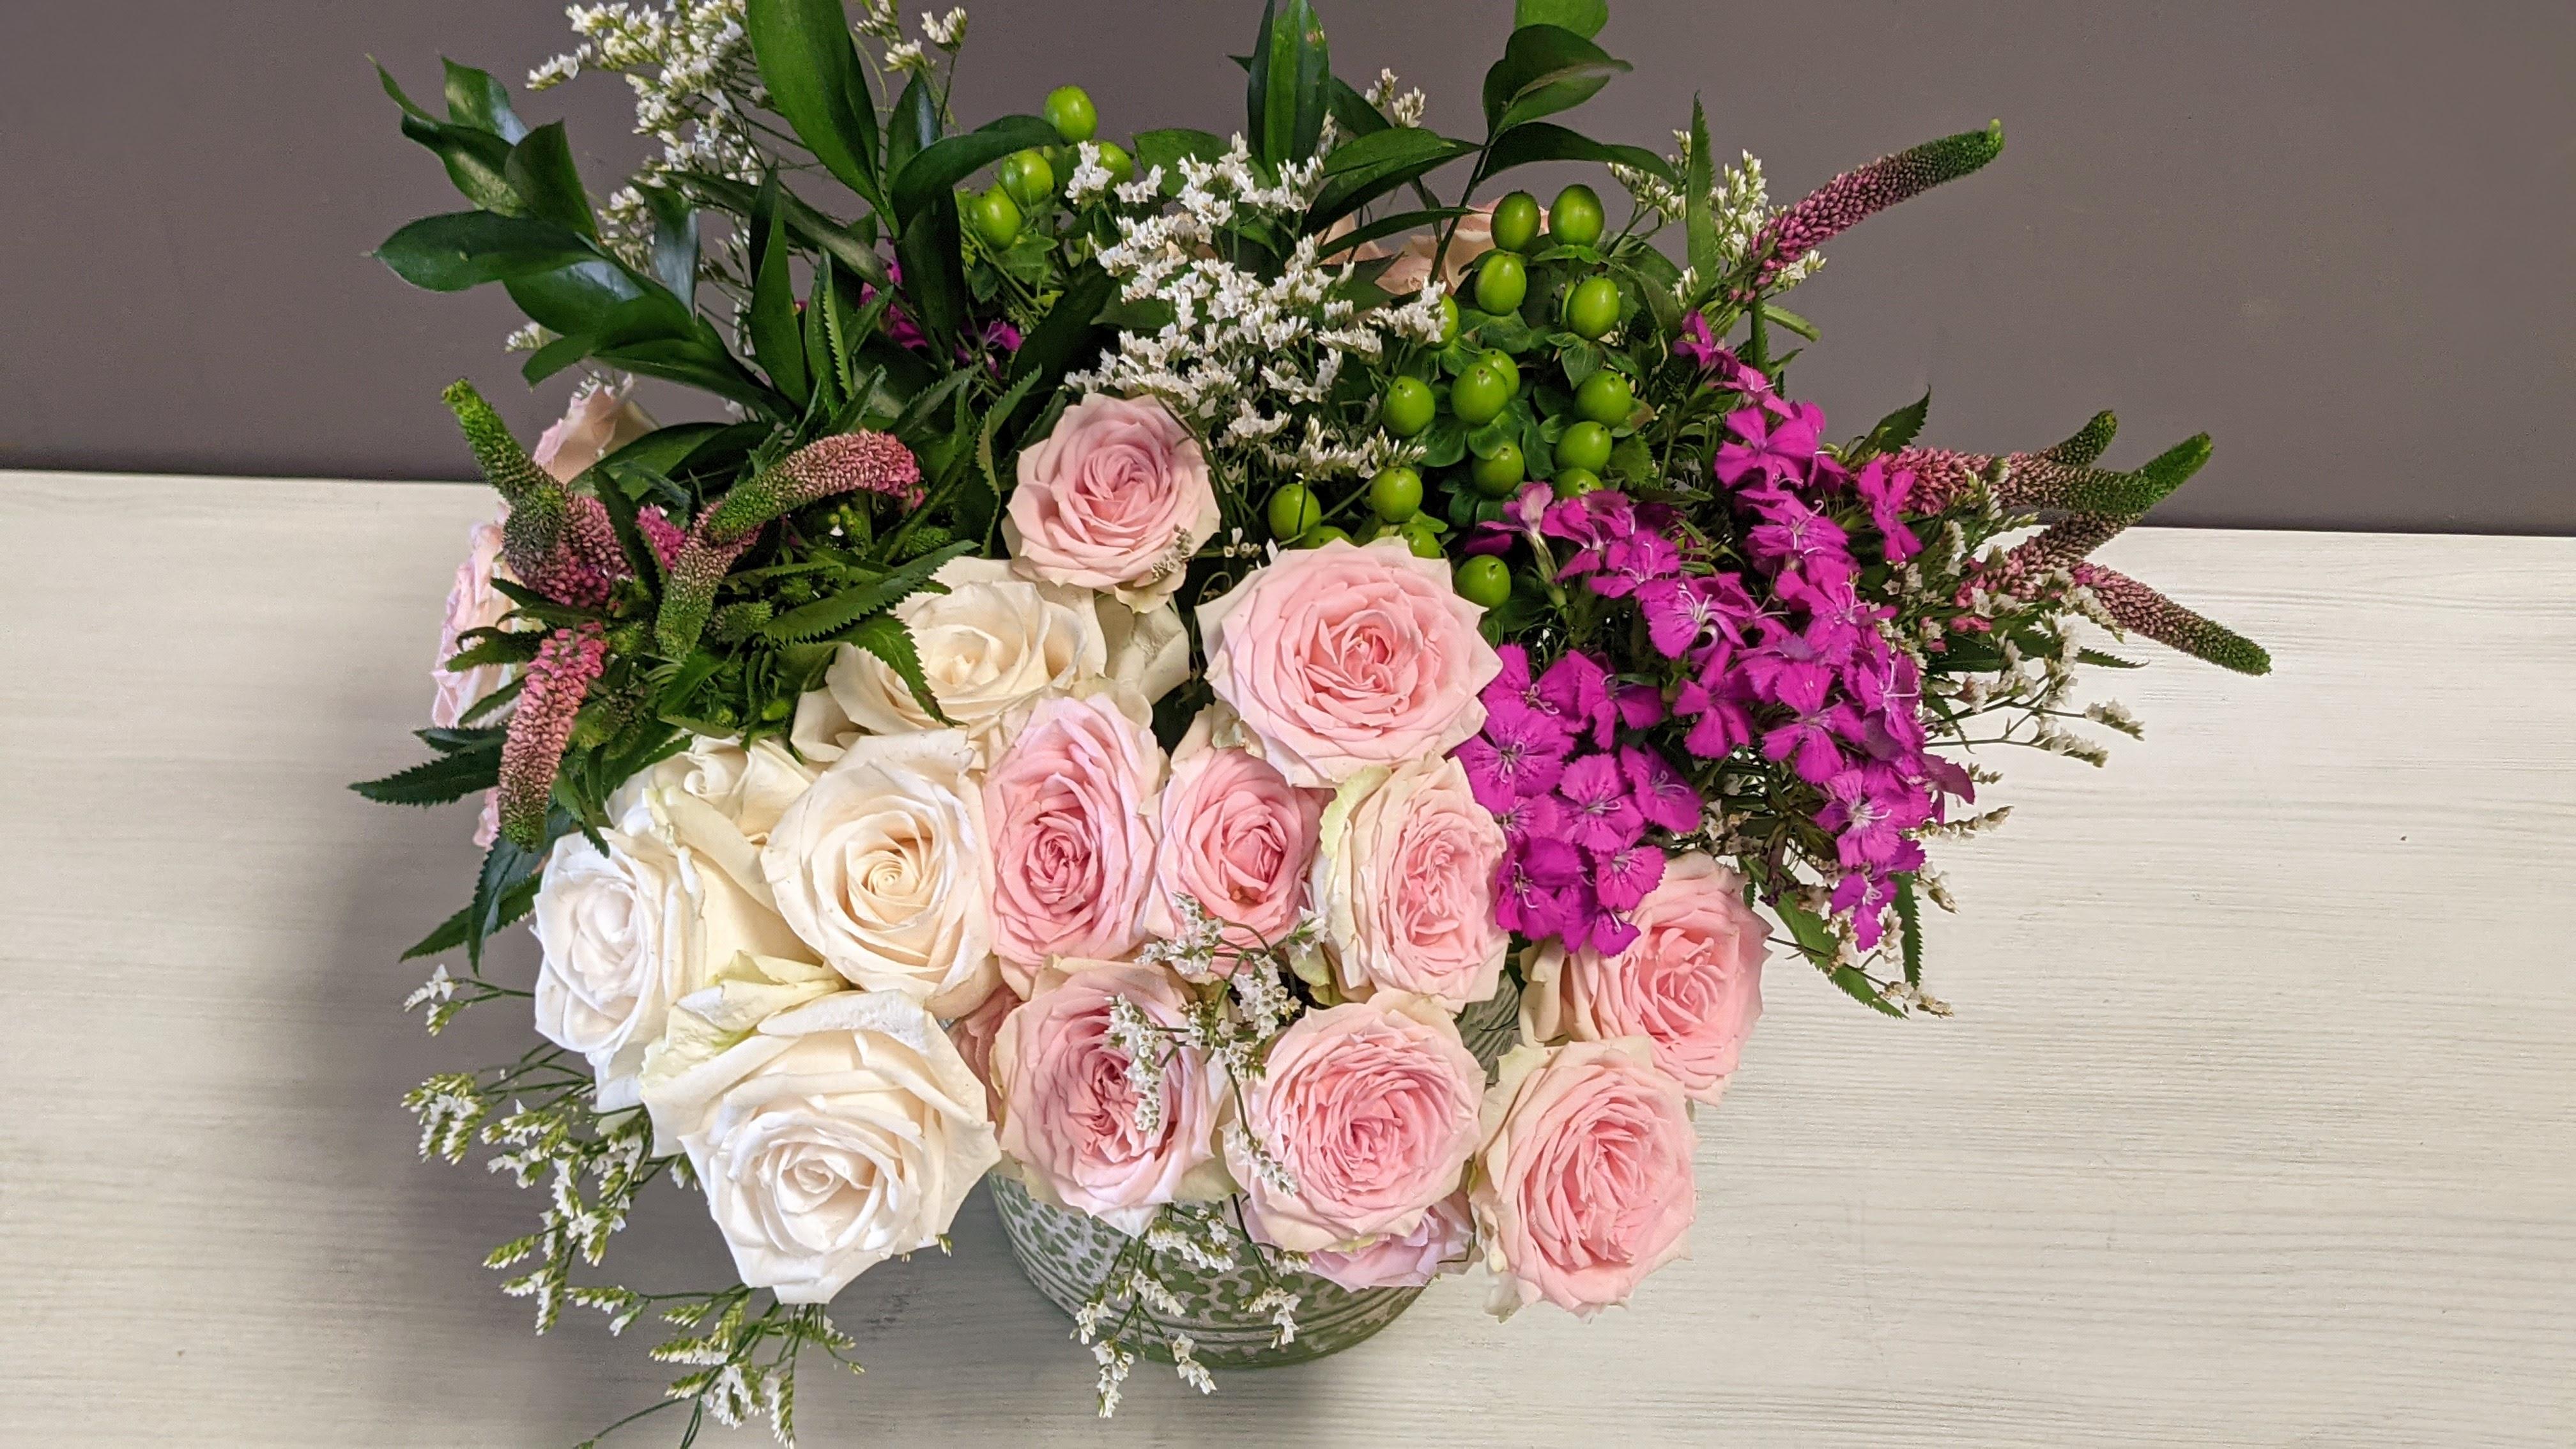 Fishbowl Flowers